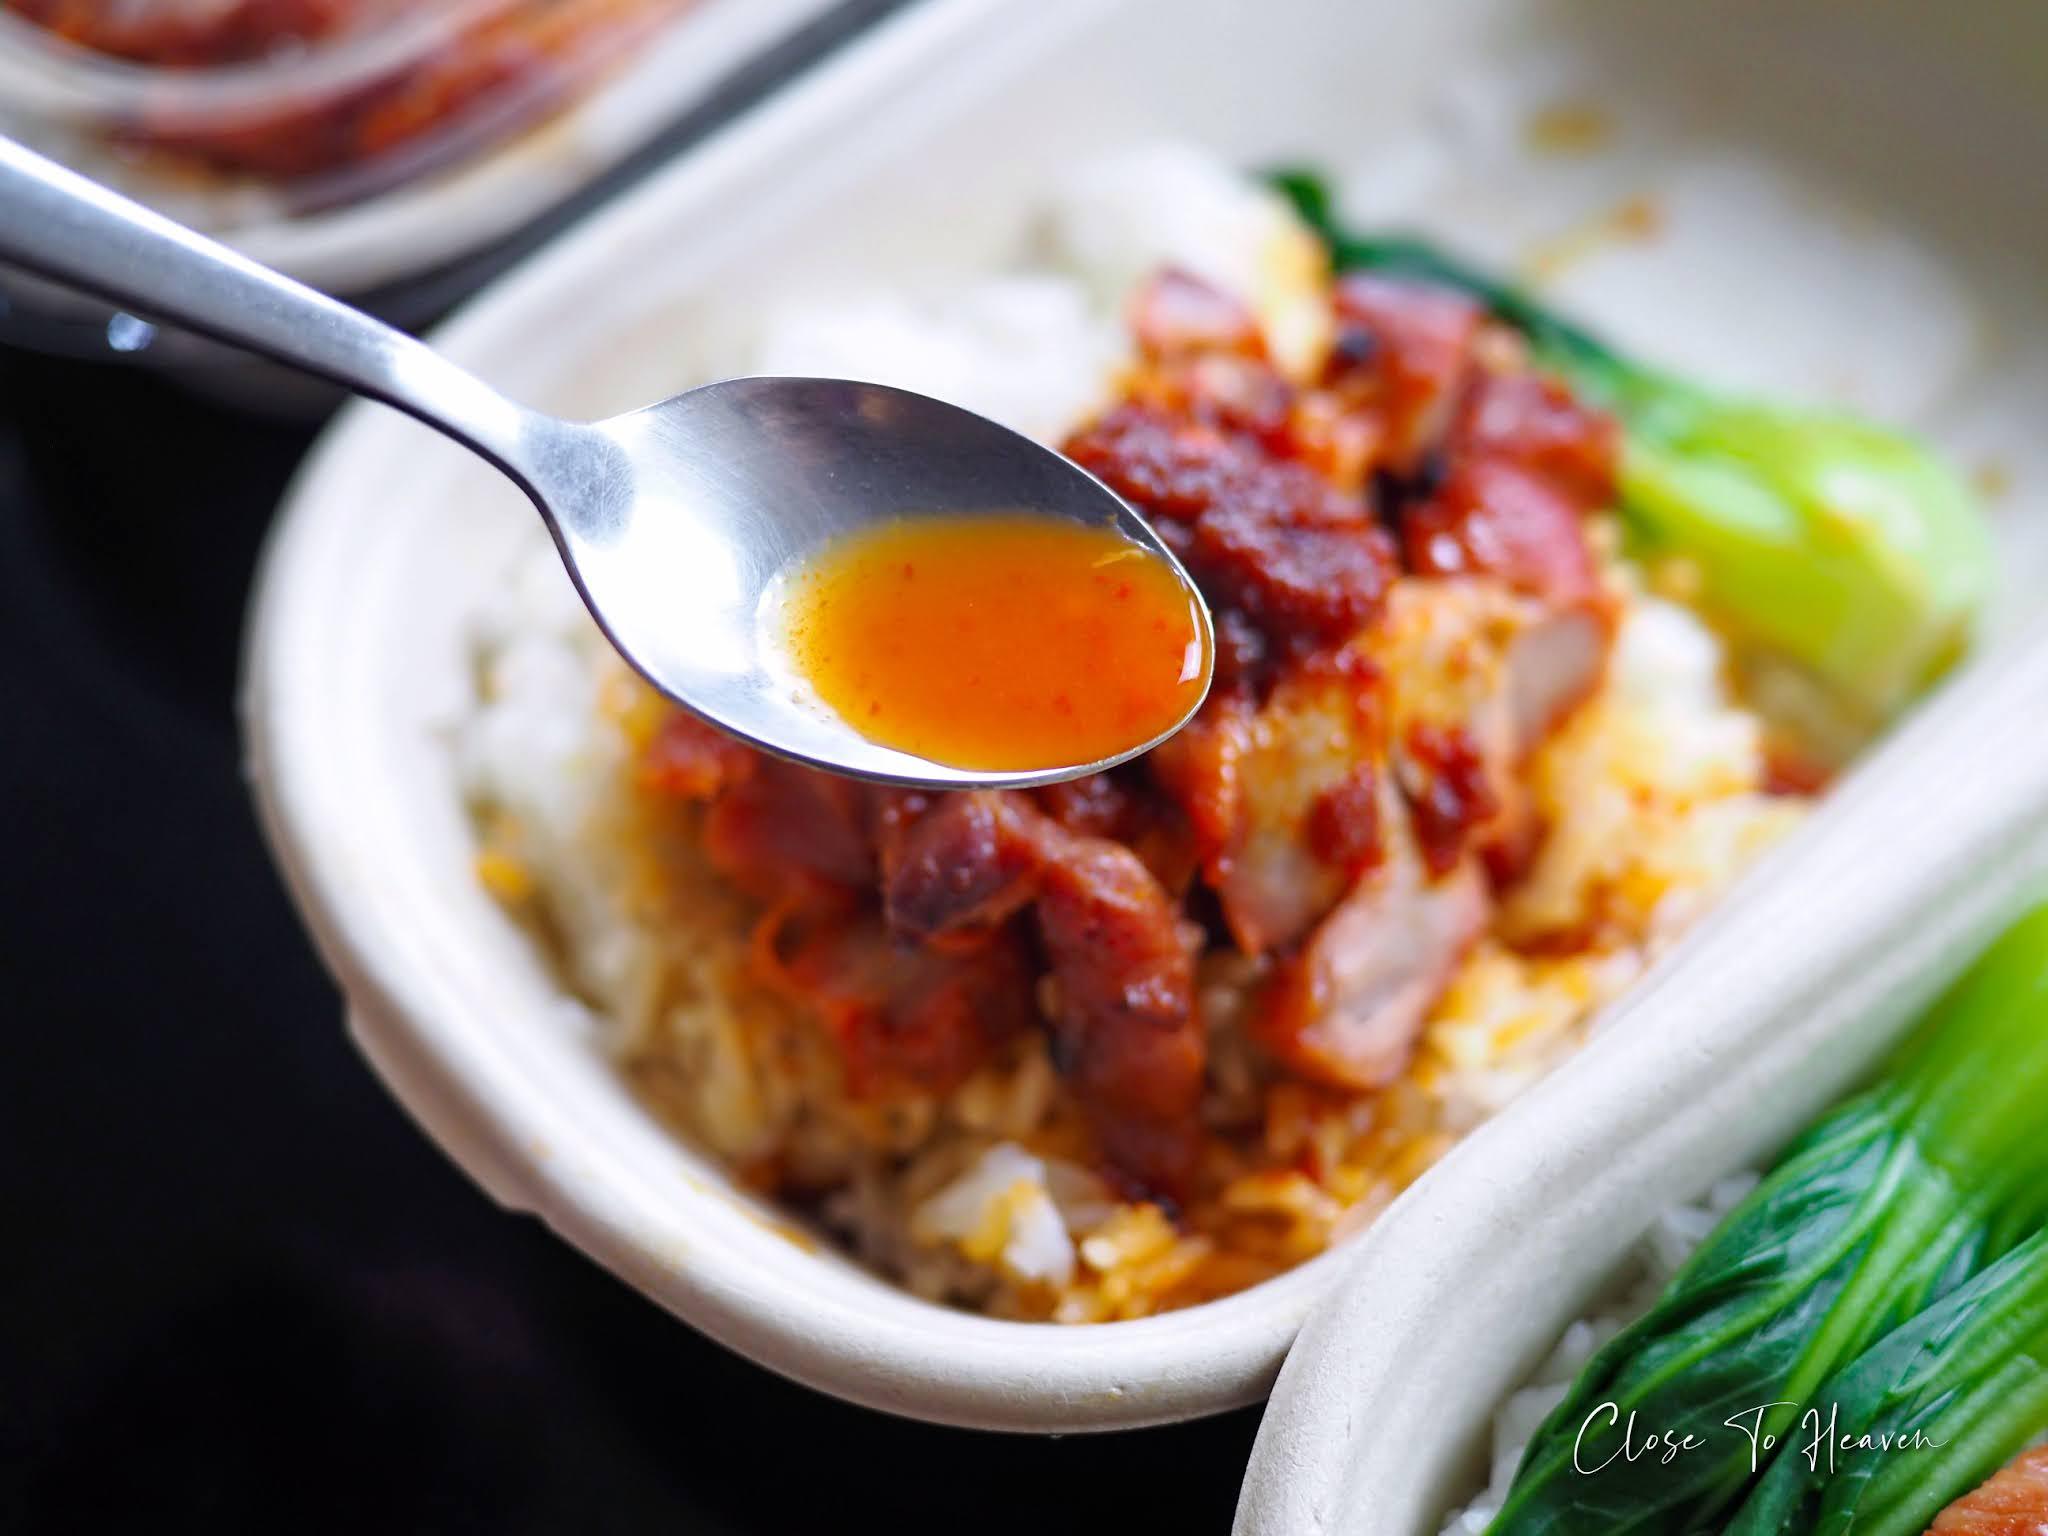 Bangkok Char Siu หมูแดงฮ่องกง ผสมไทยโบราณ